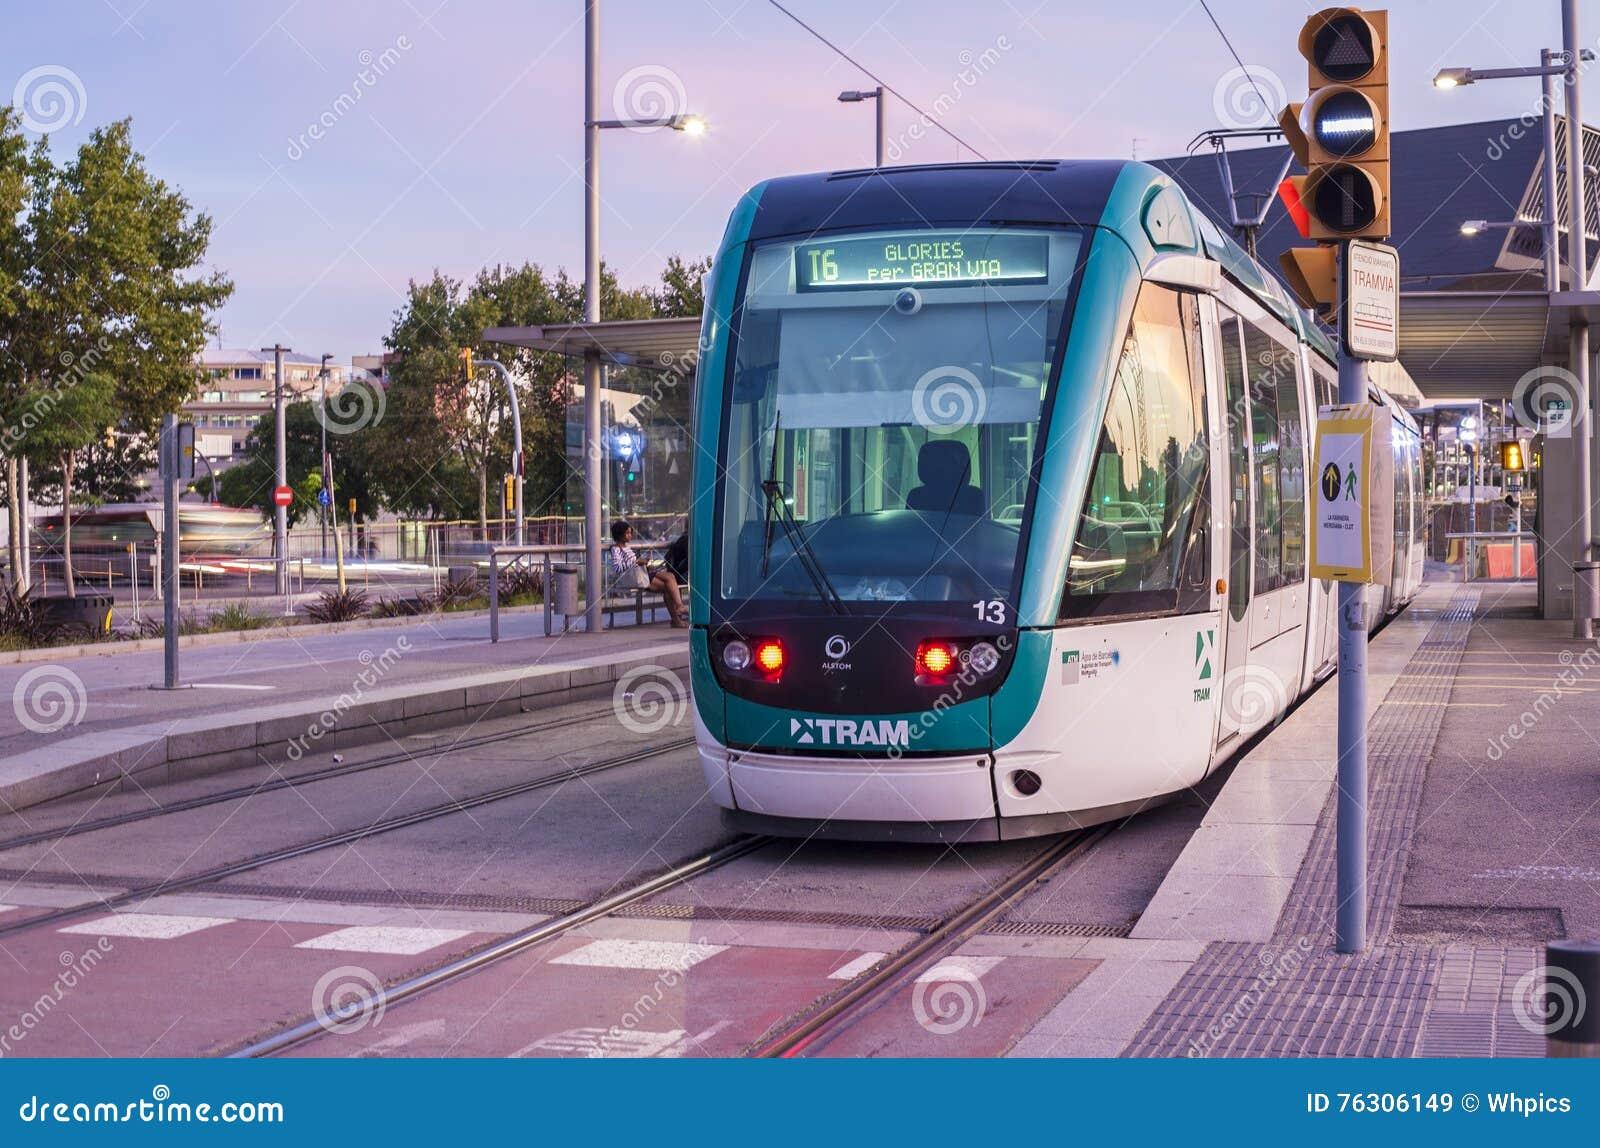 Barcelona tram at dusk